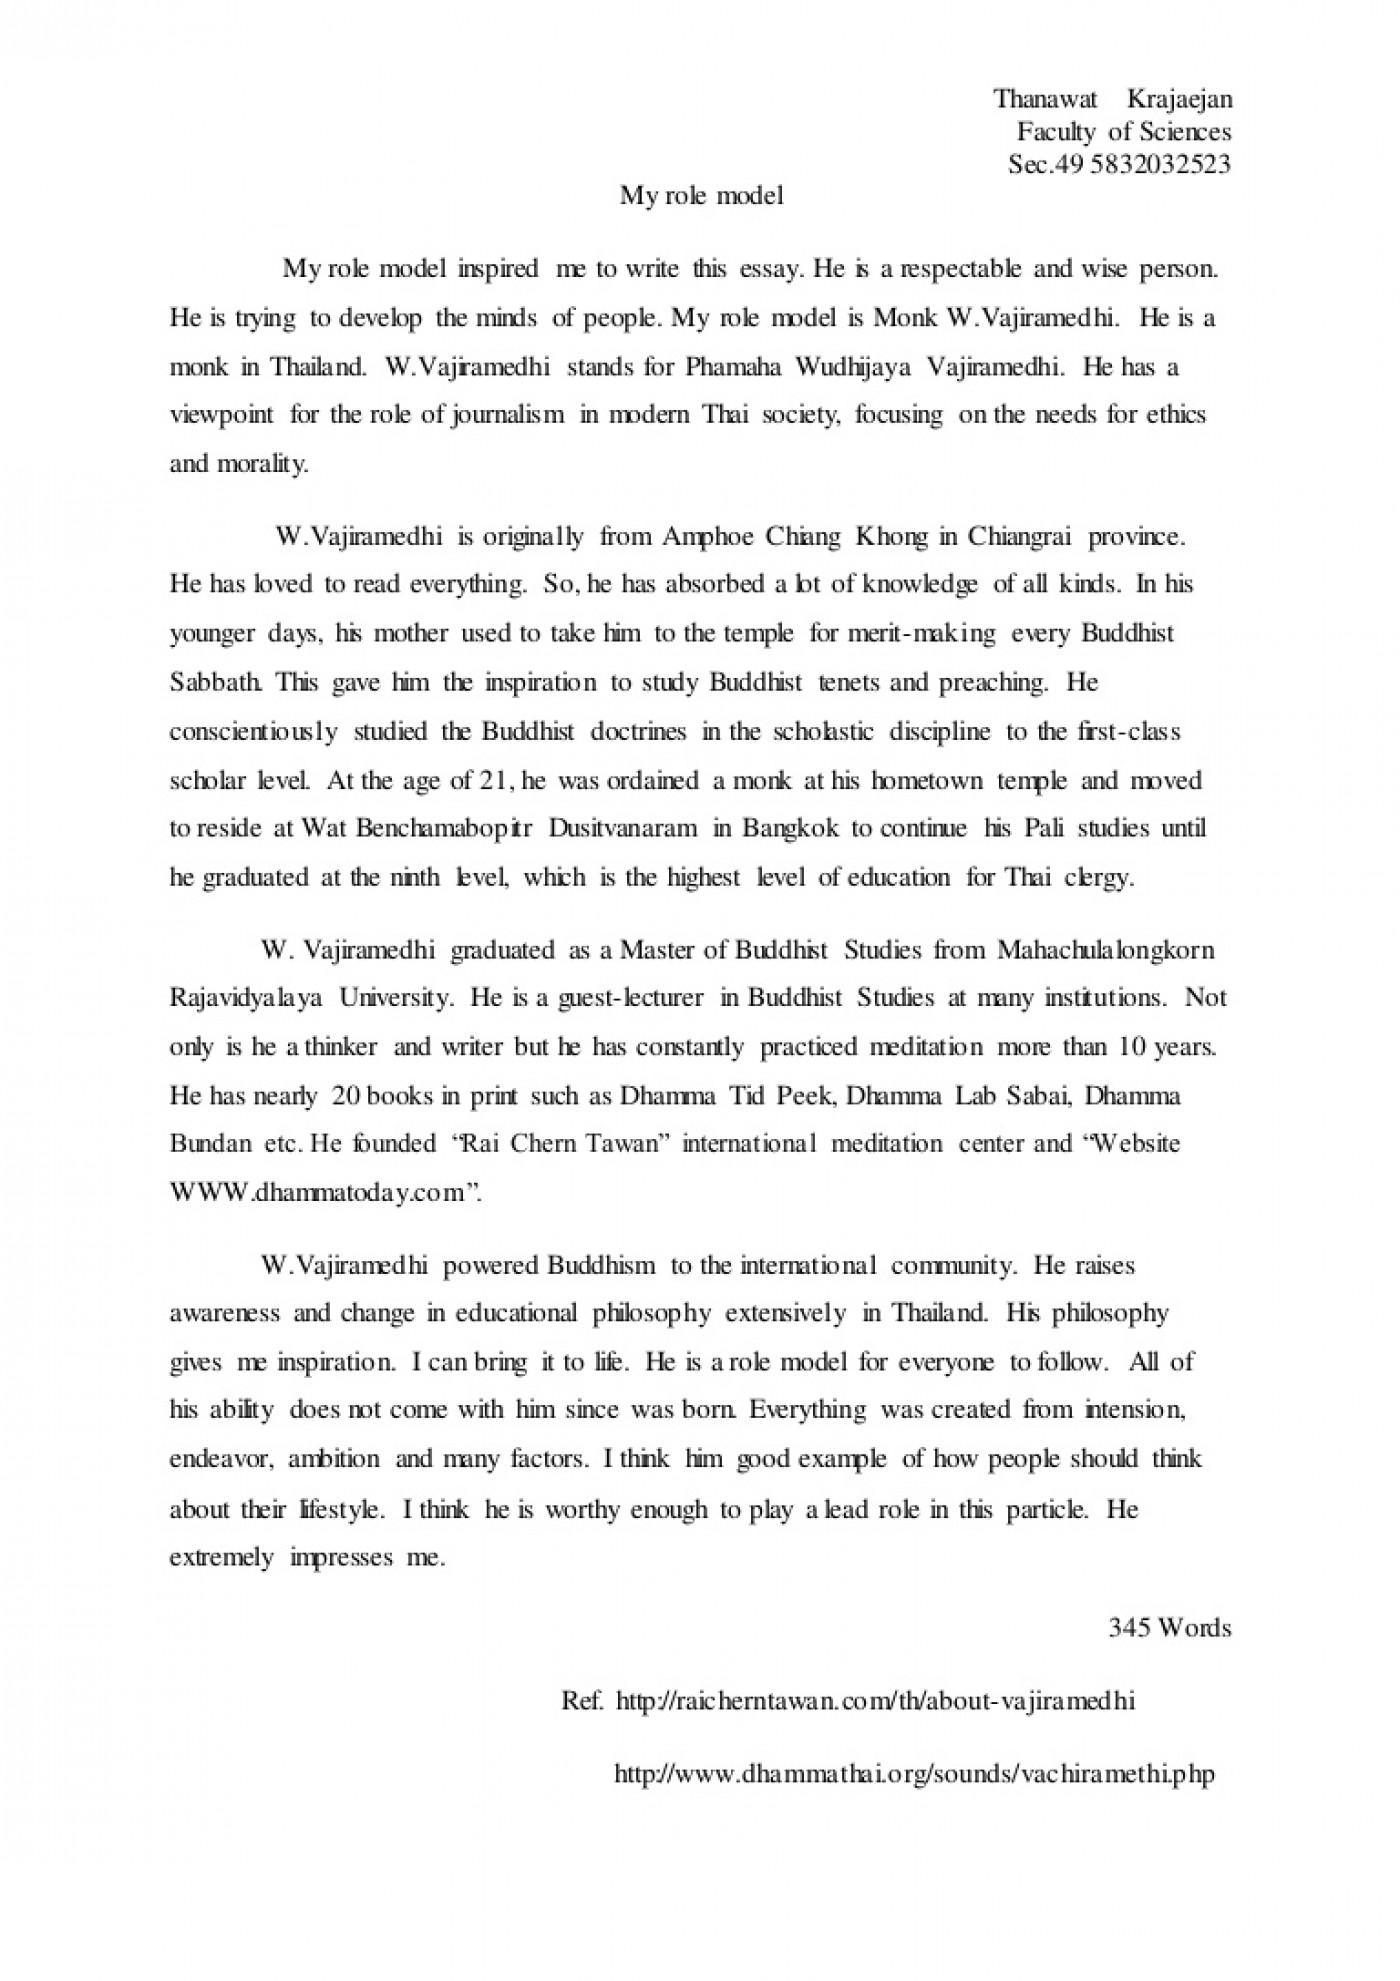 002 Essay Example Role Models Model L Thatsnotus